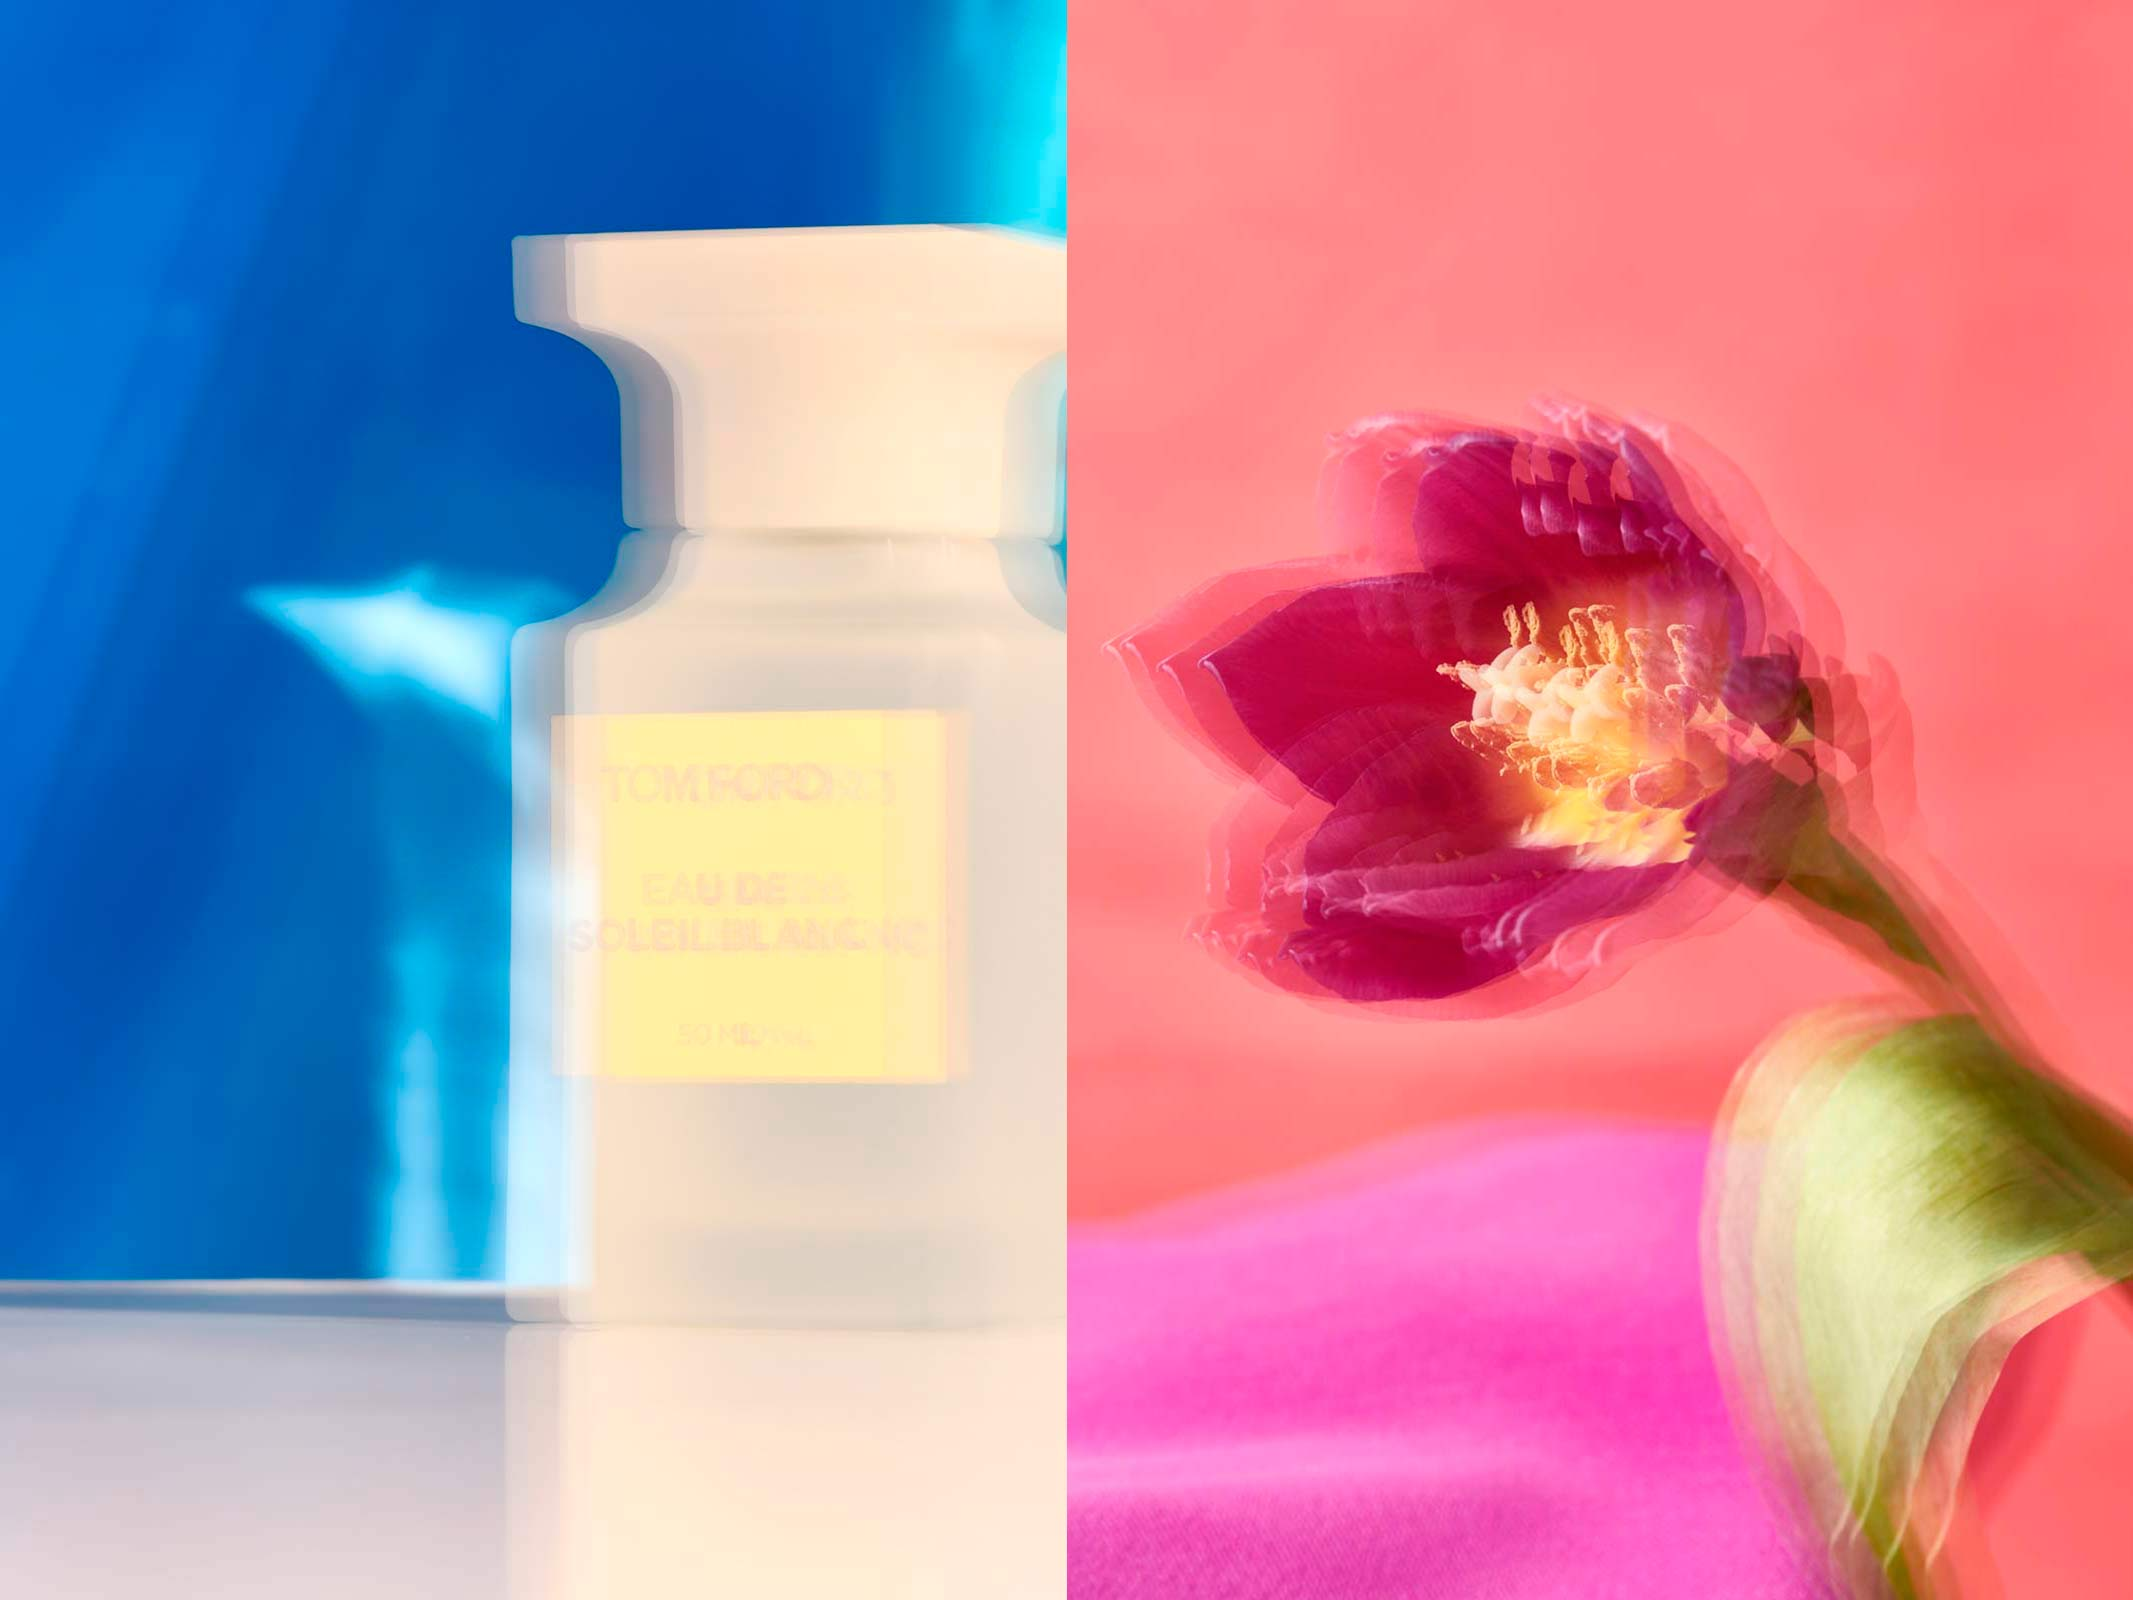 Tom_ford_tulip_floral.jpg